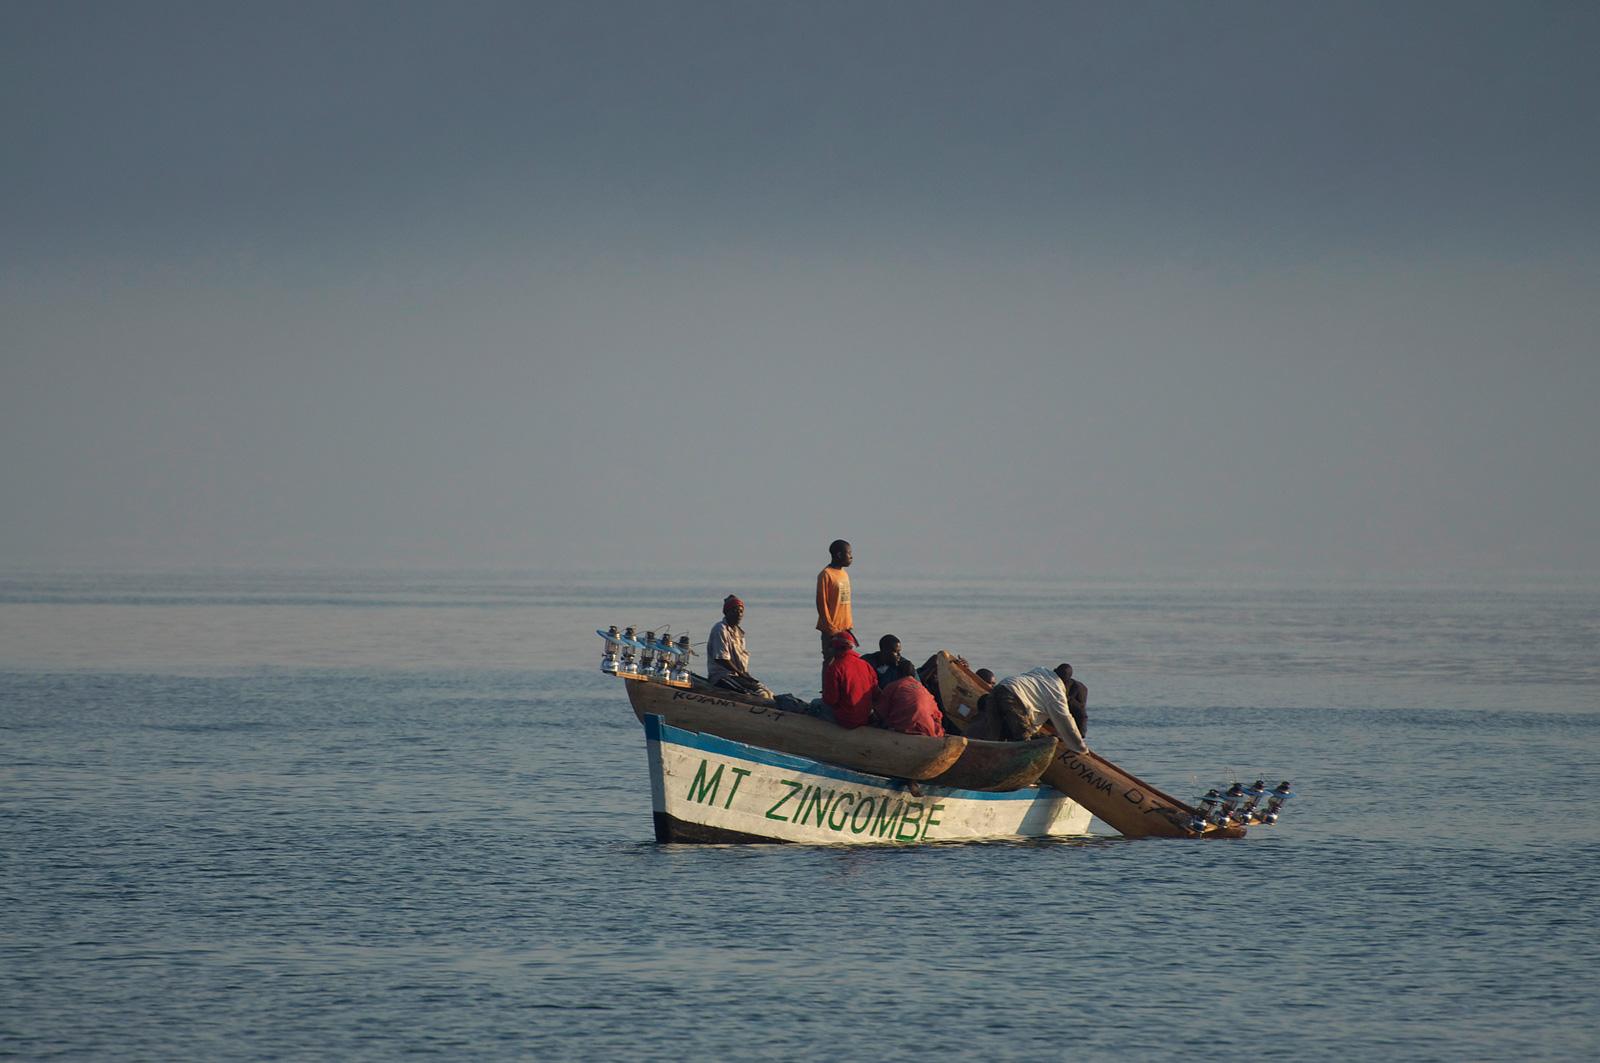 Africna-adventure-jeff-tyser-kerryn-lee-maggs-Cape_Maclear_Fishing_Boat